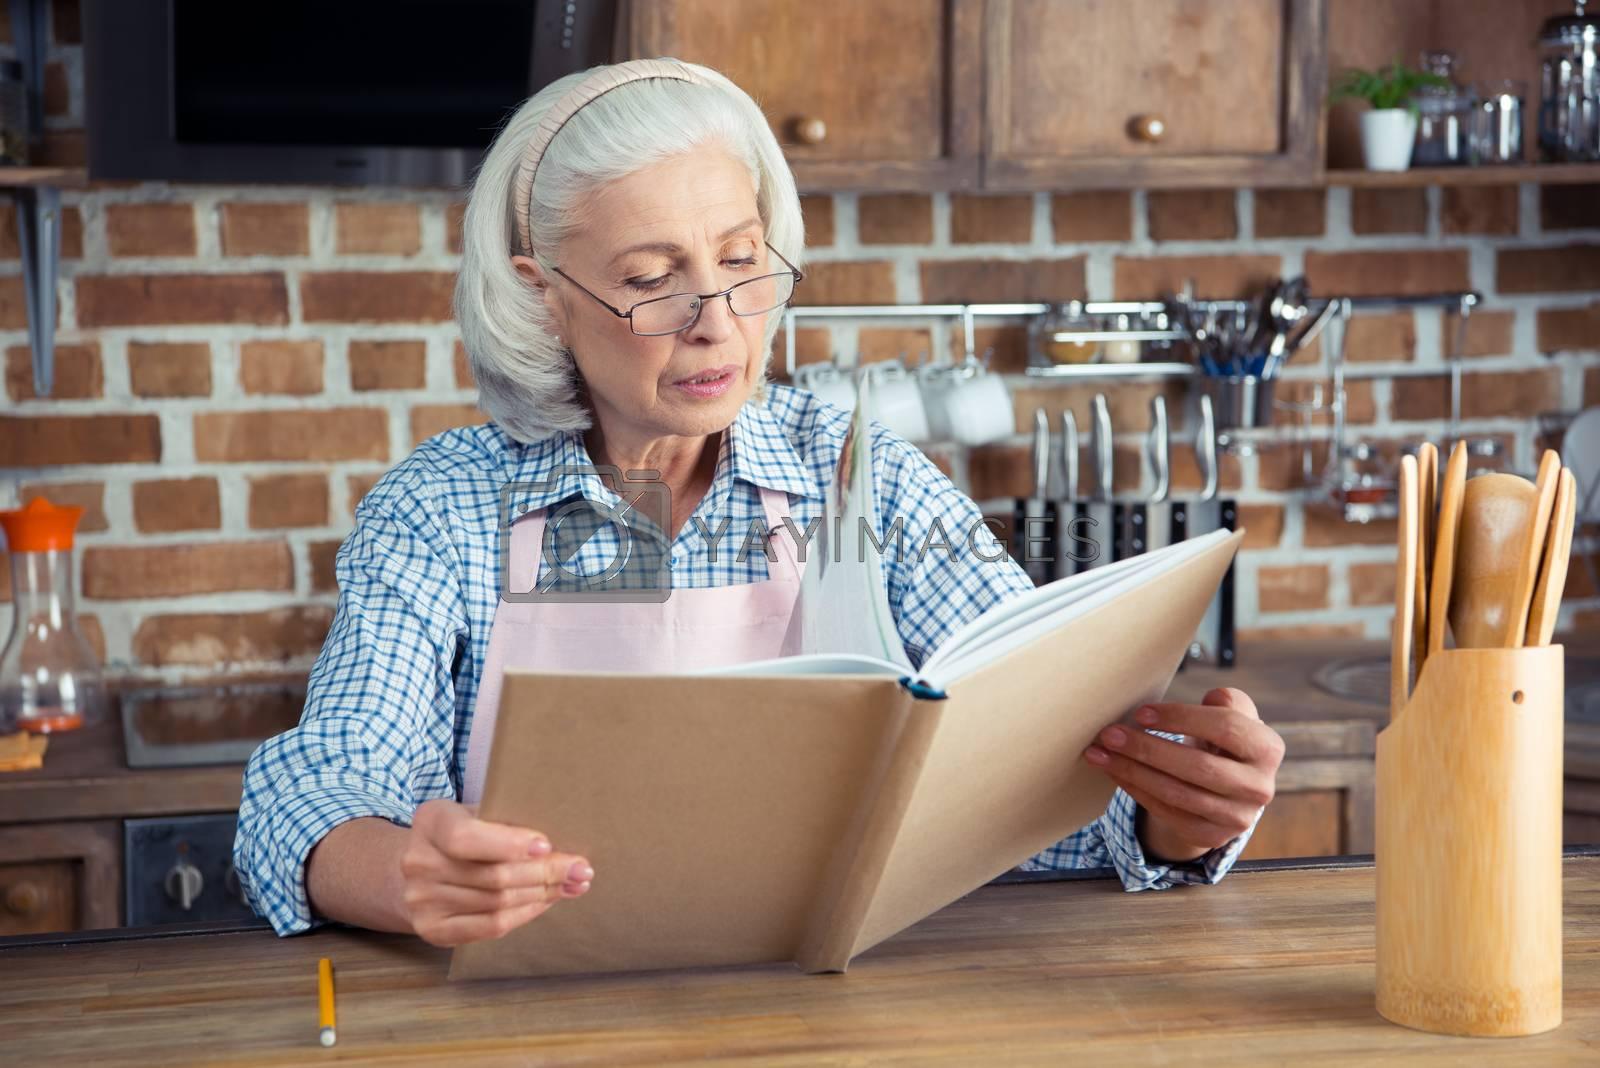 Senior woman in eyeglasses reading cookbook in kitchen